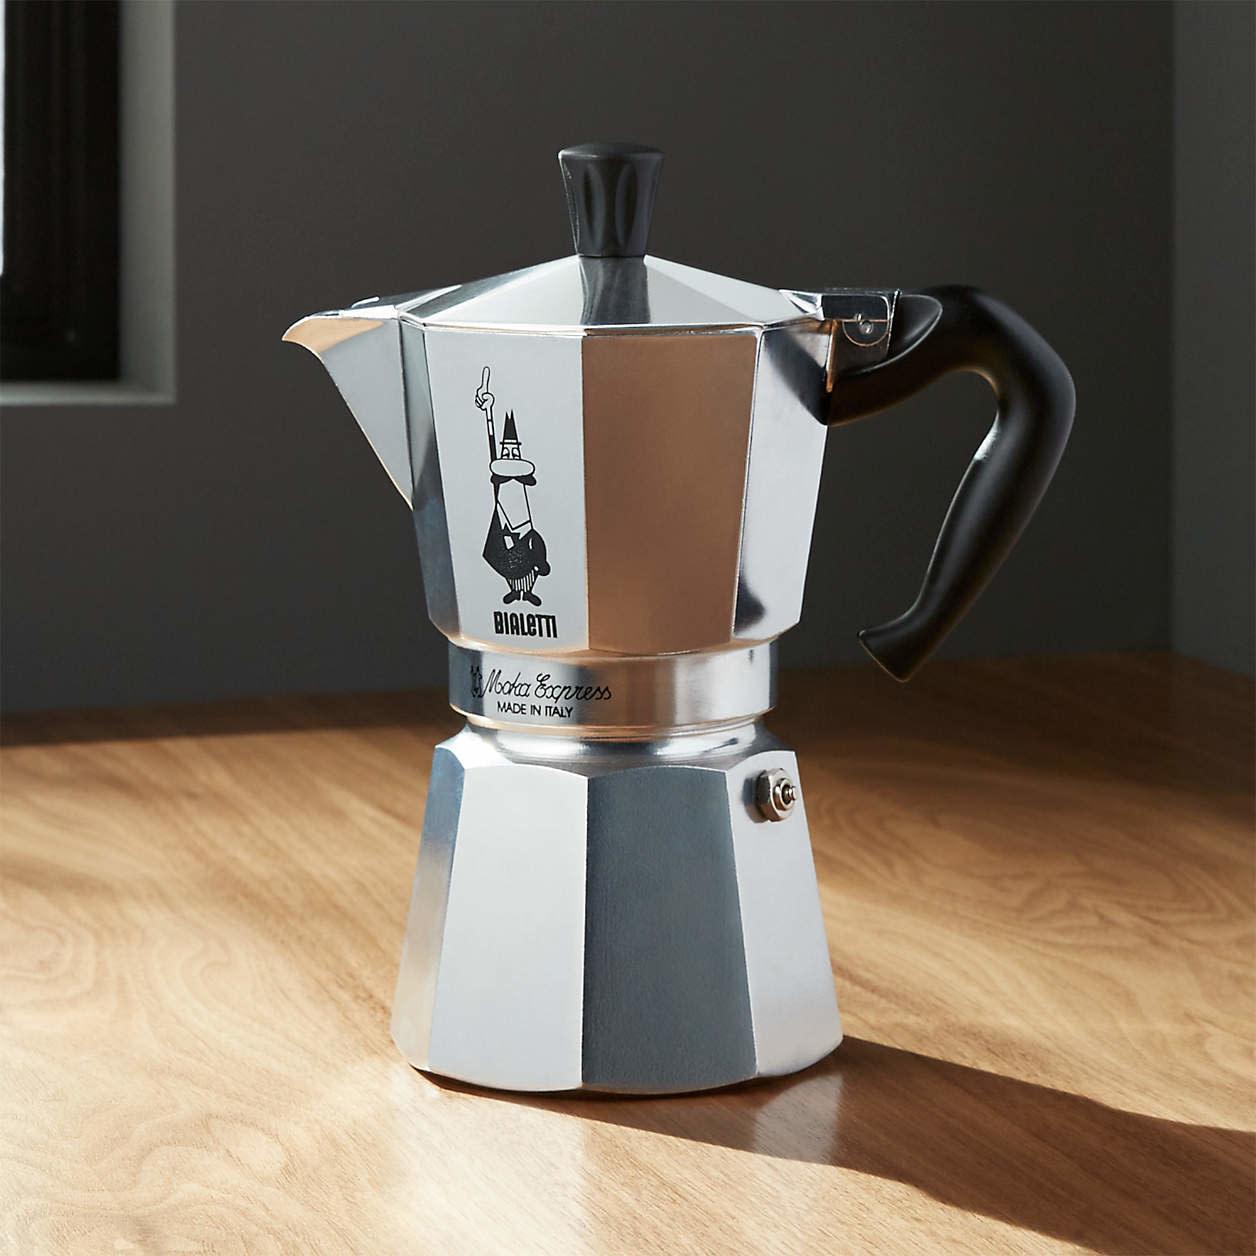 Bialetti Bialetti ® Moka Aluminum 6-Cup Espresso Maker